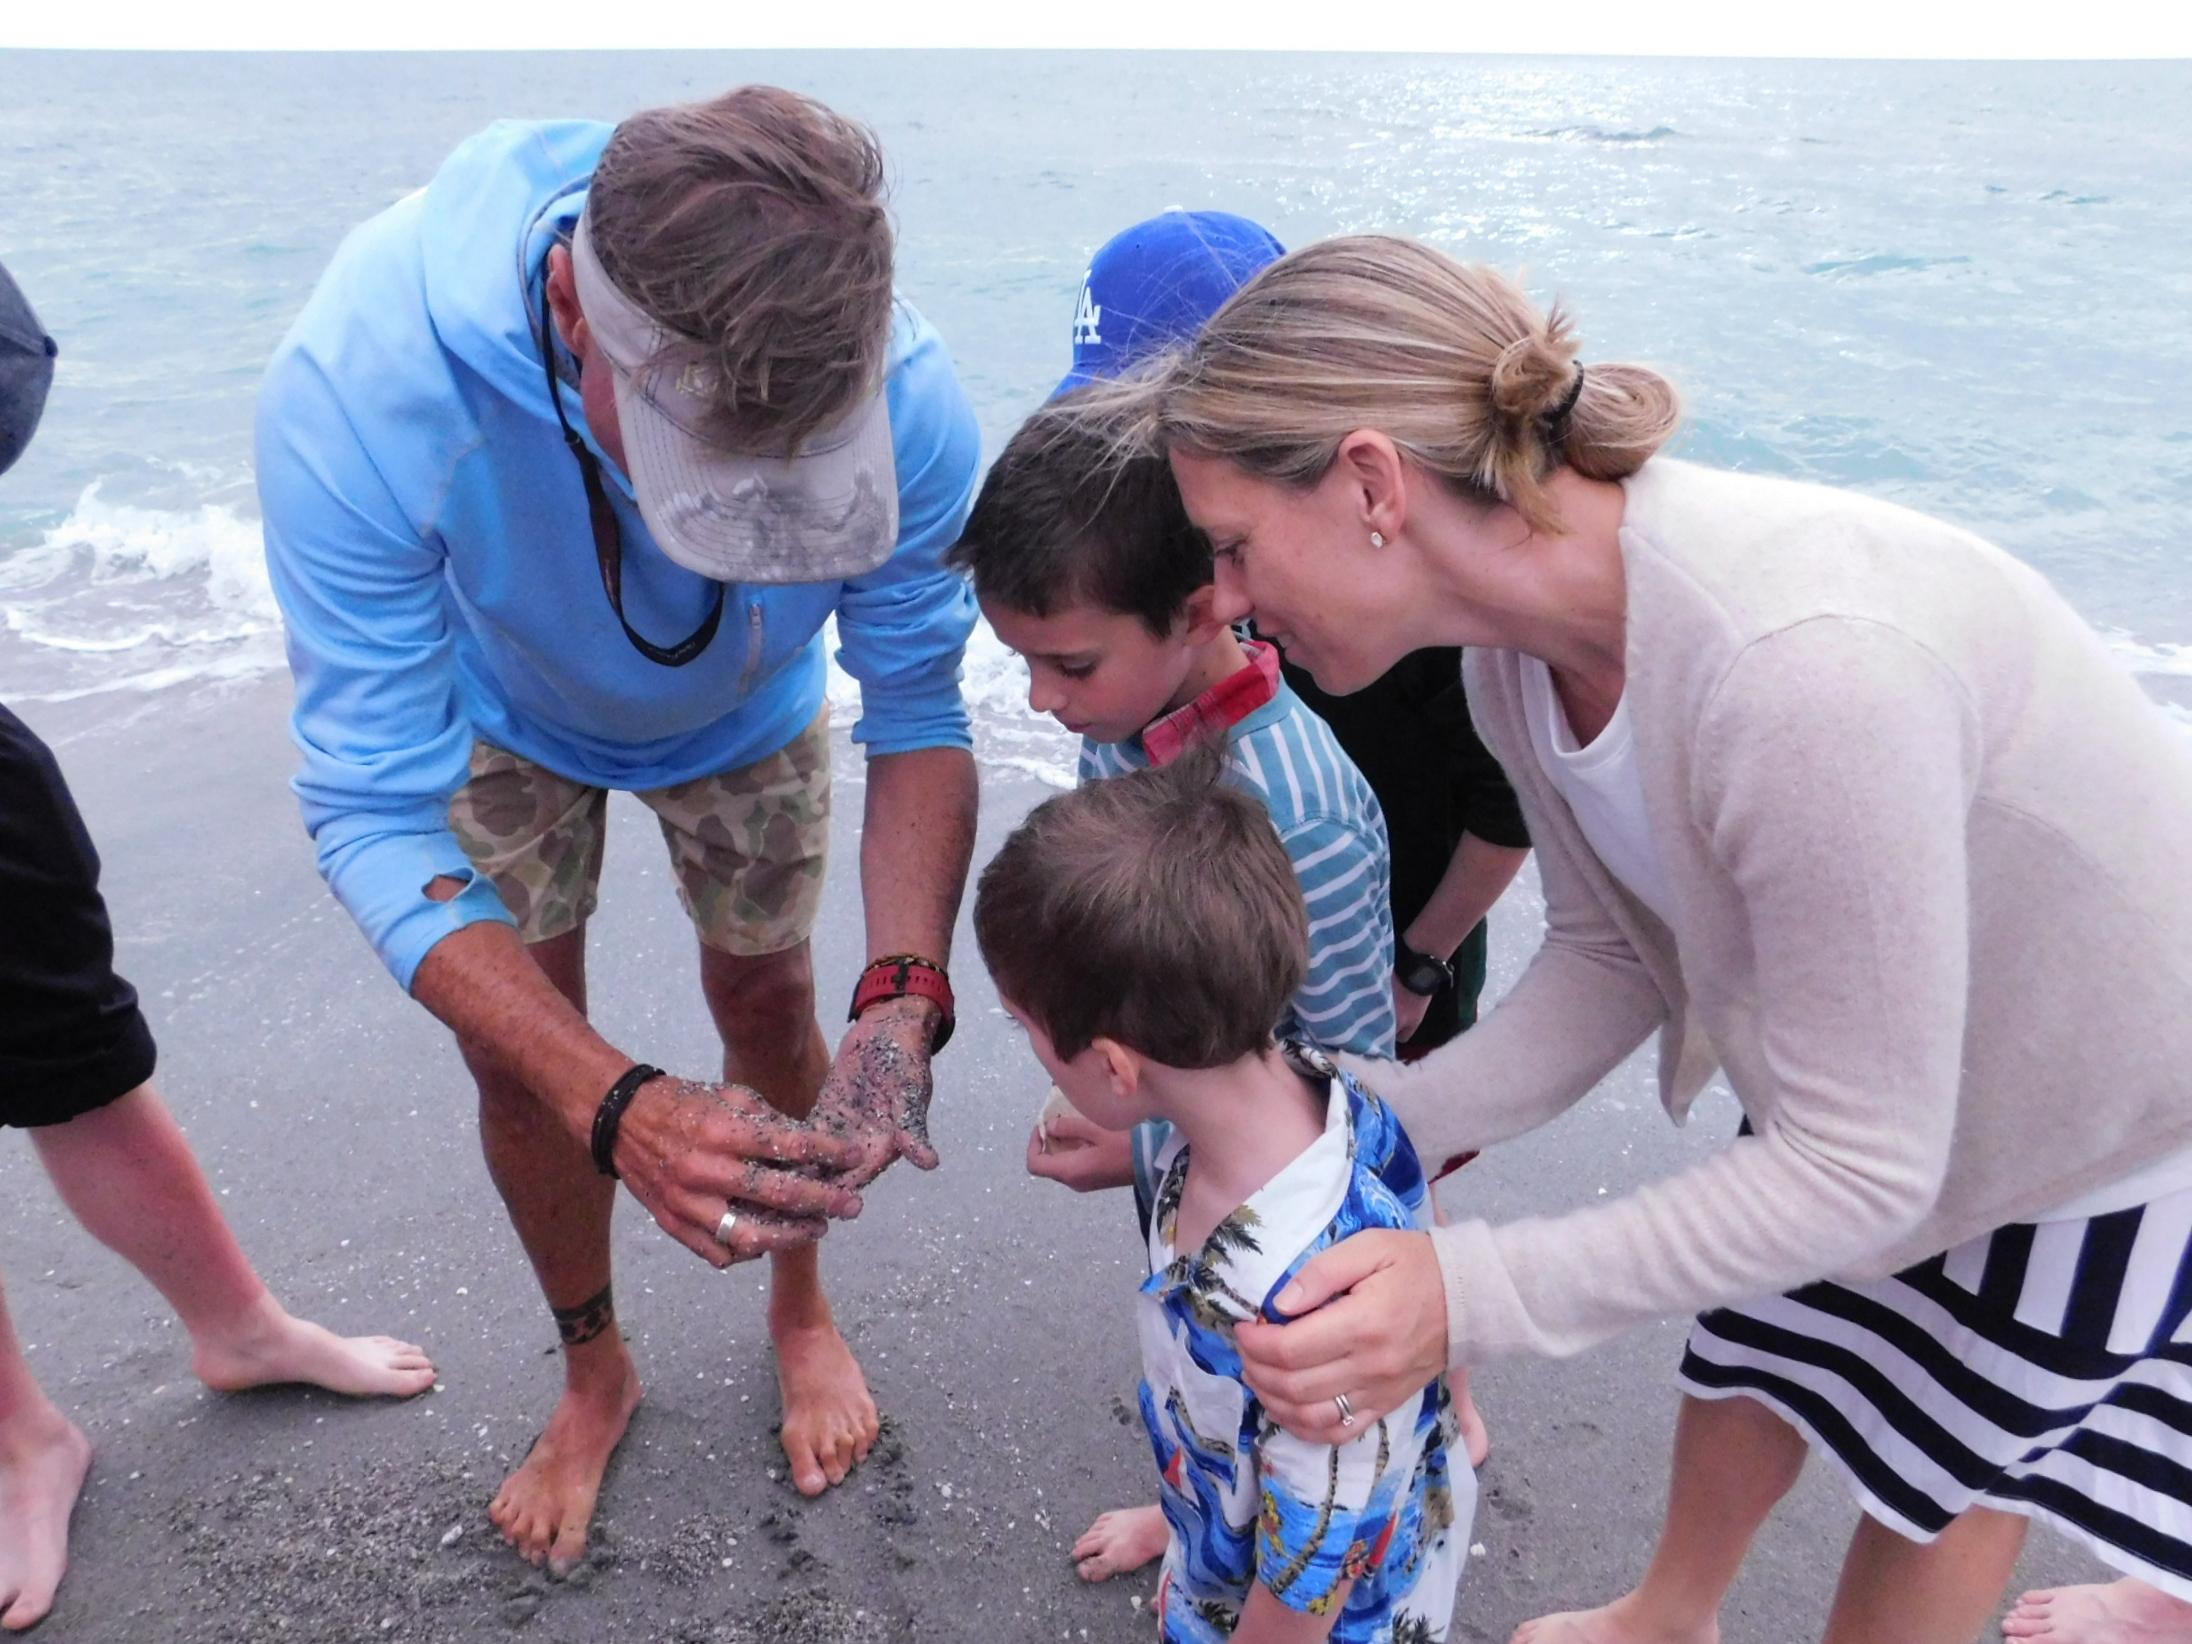 Dr. Bruce Neill led a beach walk for members of the Captiva Yacht Club. Photo courtesy of Captiva Yacht Club.